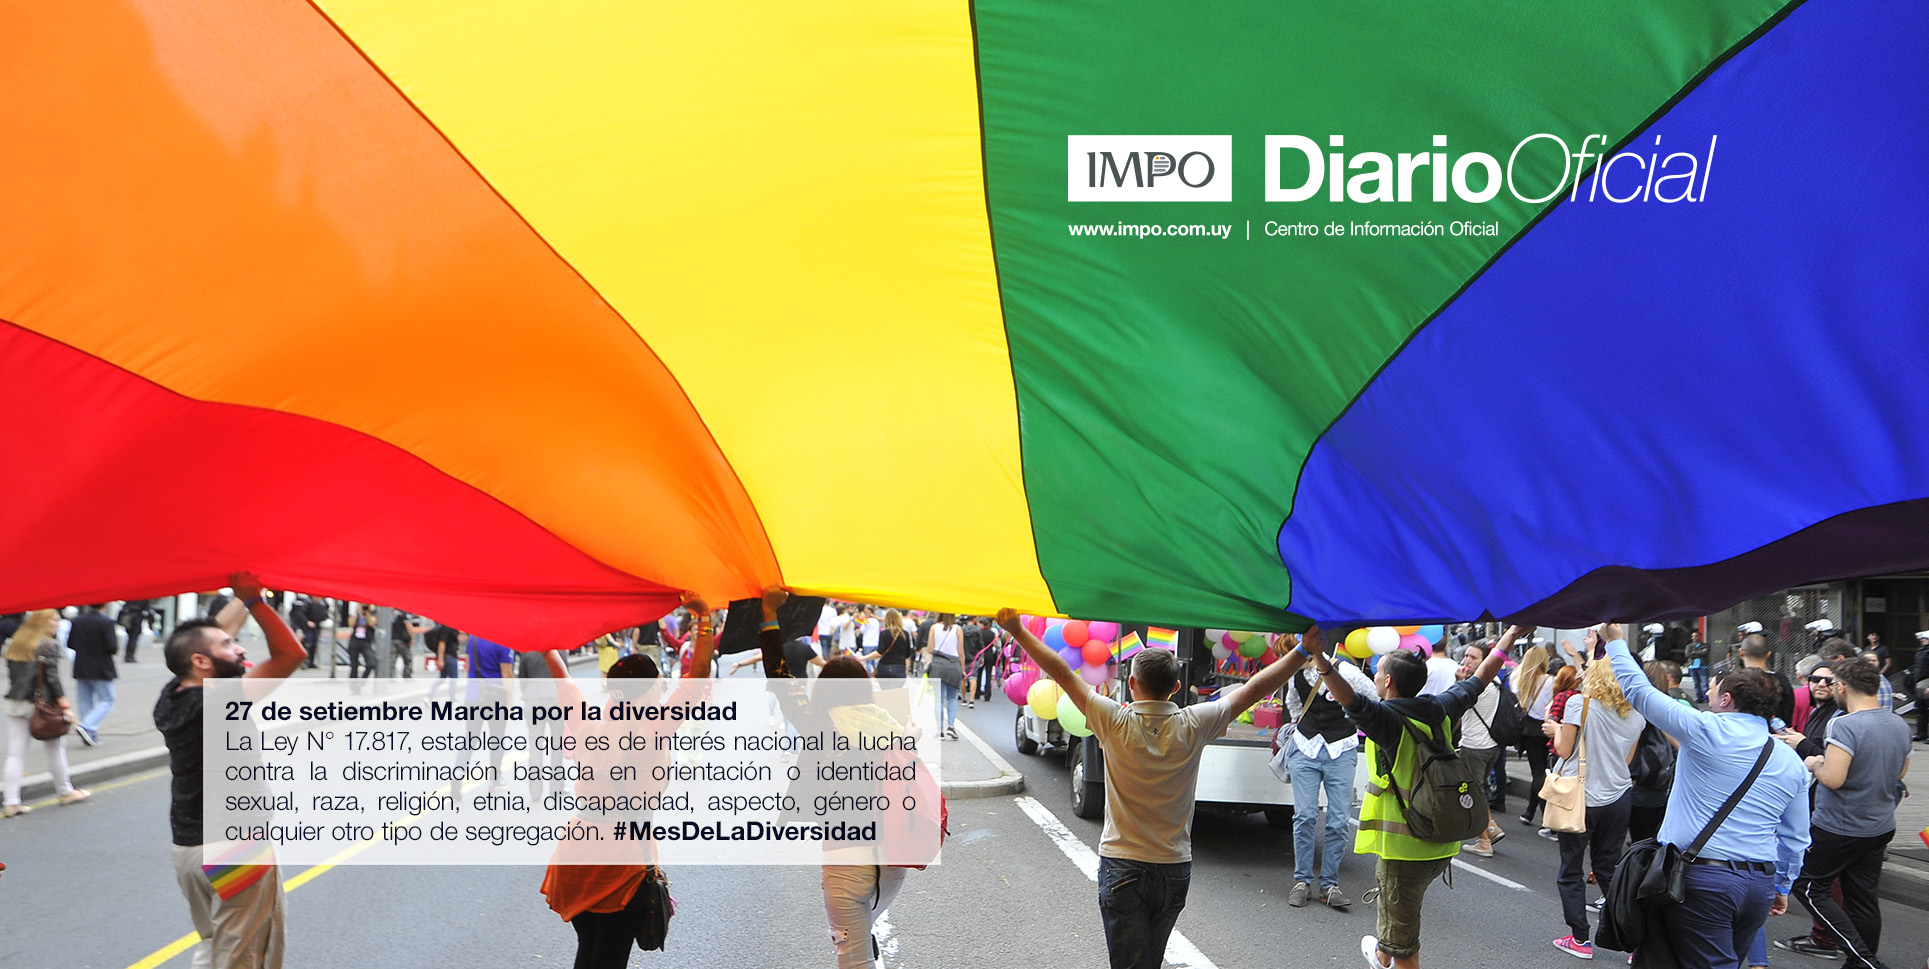 Participantes De Manifestación Cubiertos Por Bandera De Arcoiris